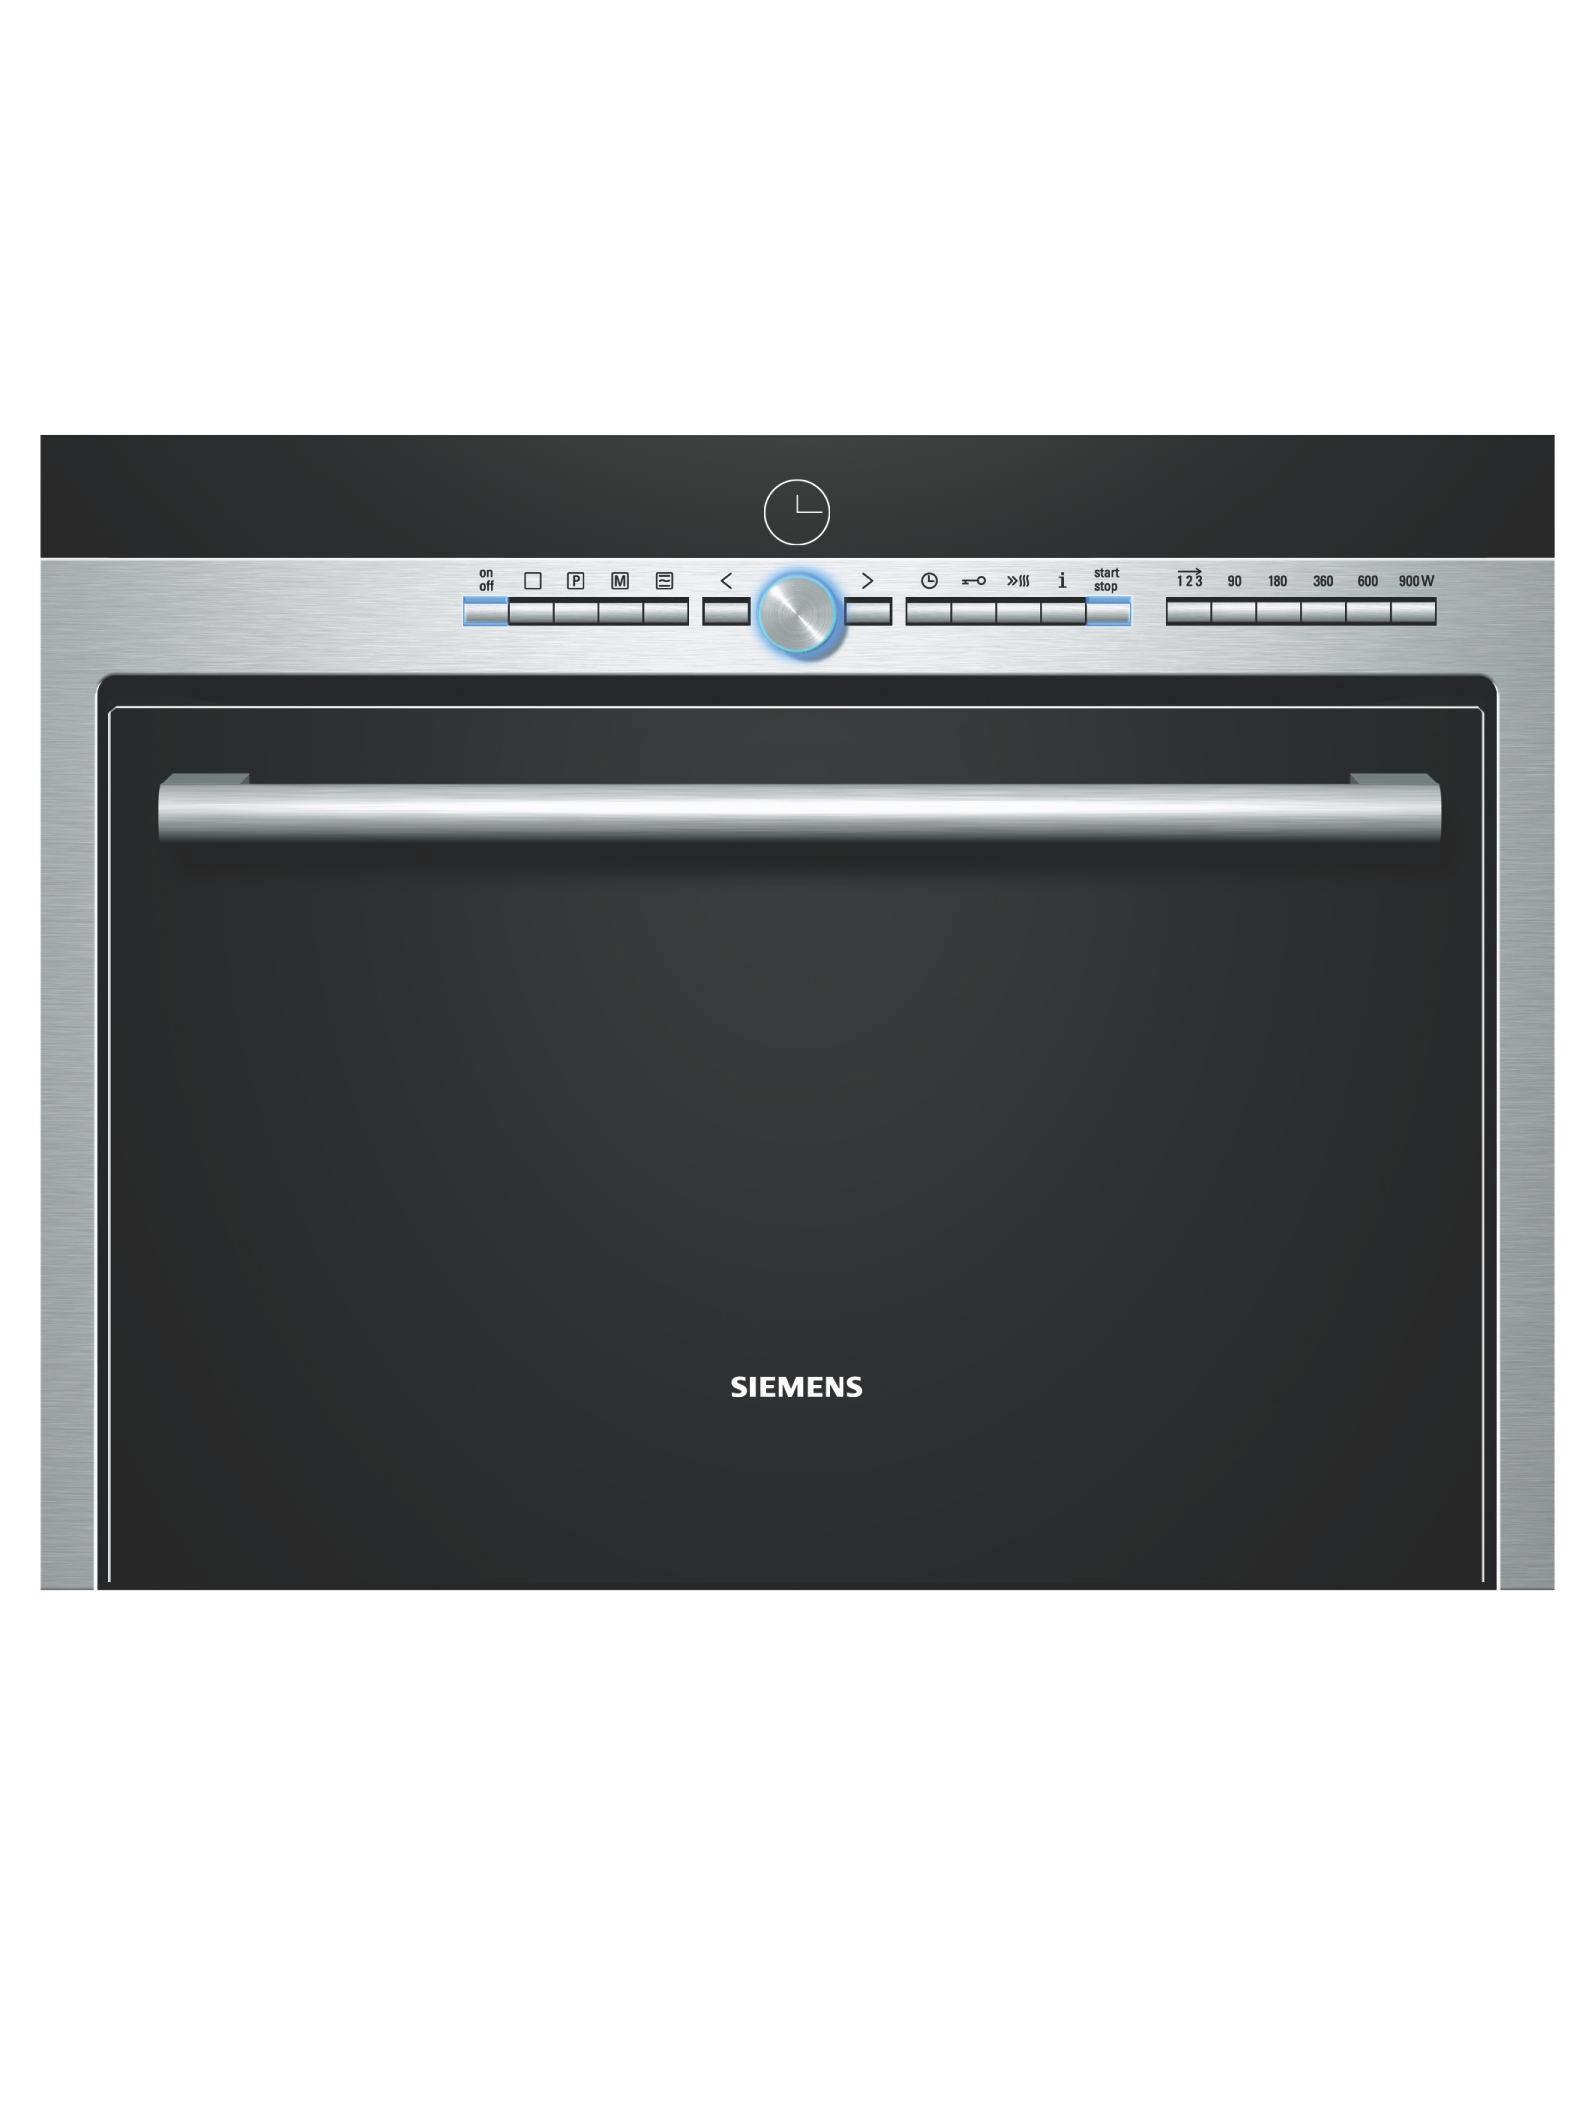 Kompaktbackofen Siemens Hb86k575, 3600 Watt - Metall (59,5/45,4/53,1cm) - SIEMENS